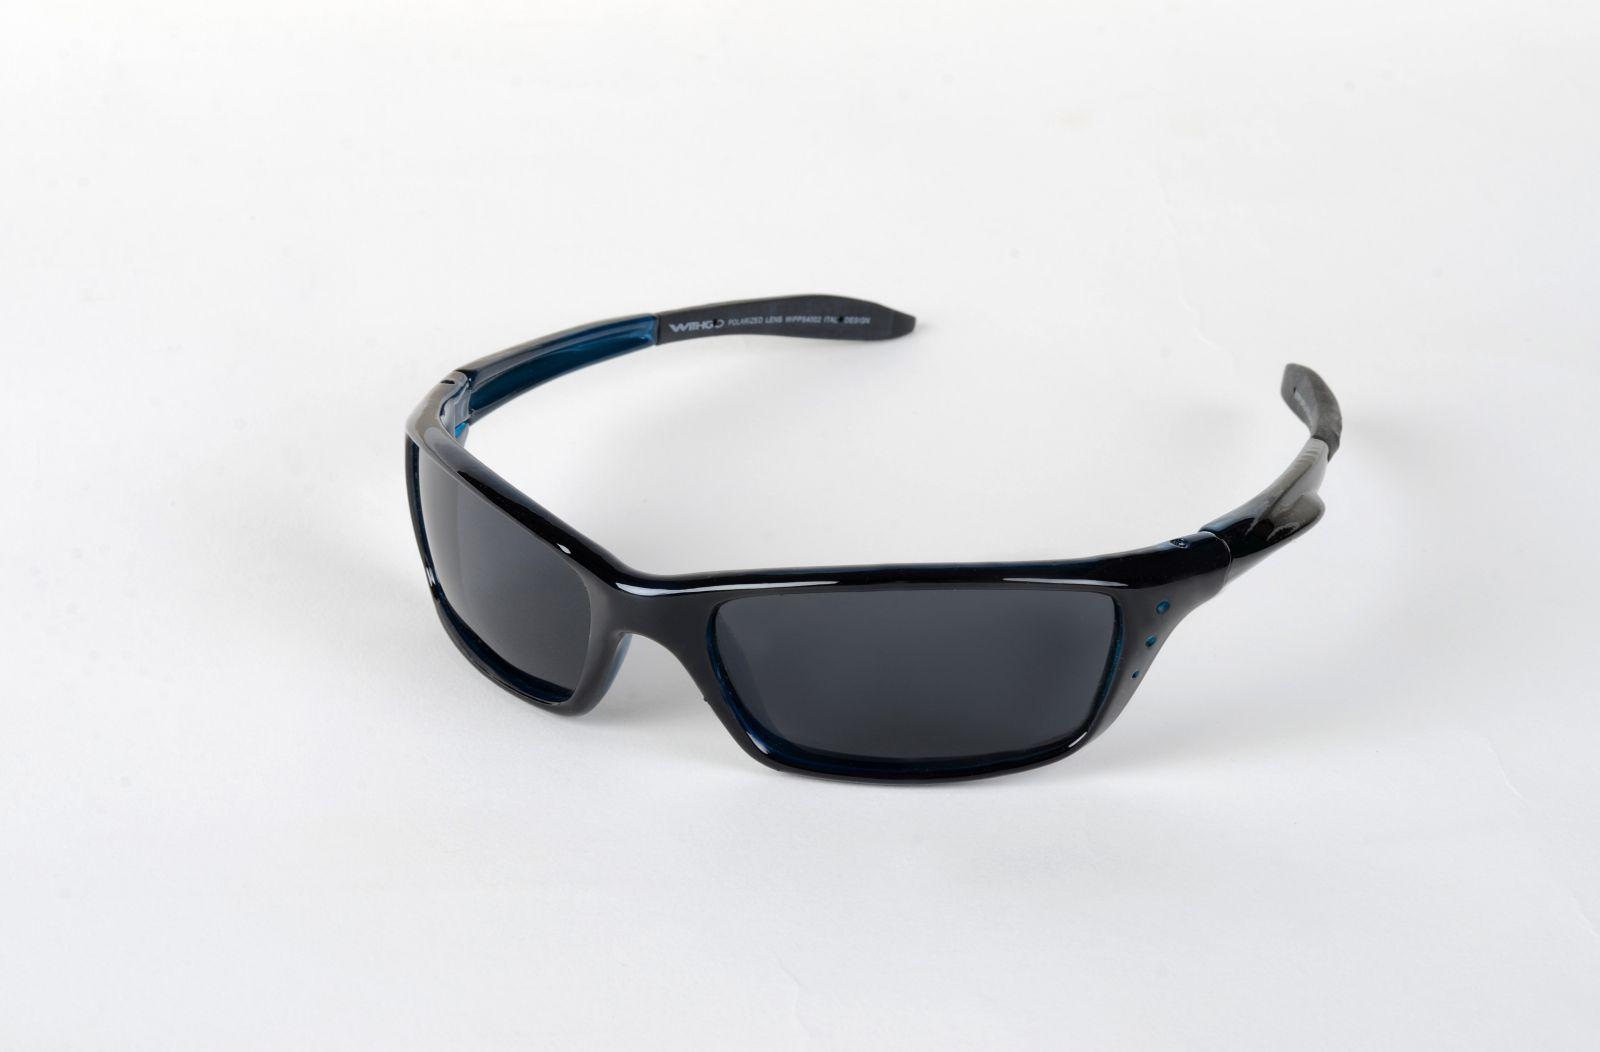 Polarizační brýle 4002 tmavomodré čočky ČMO Cat.3 E-batoh